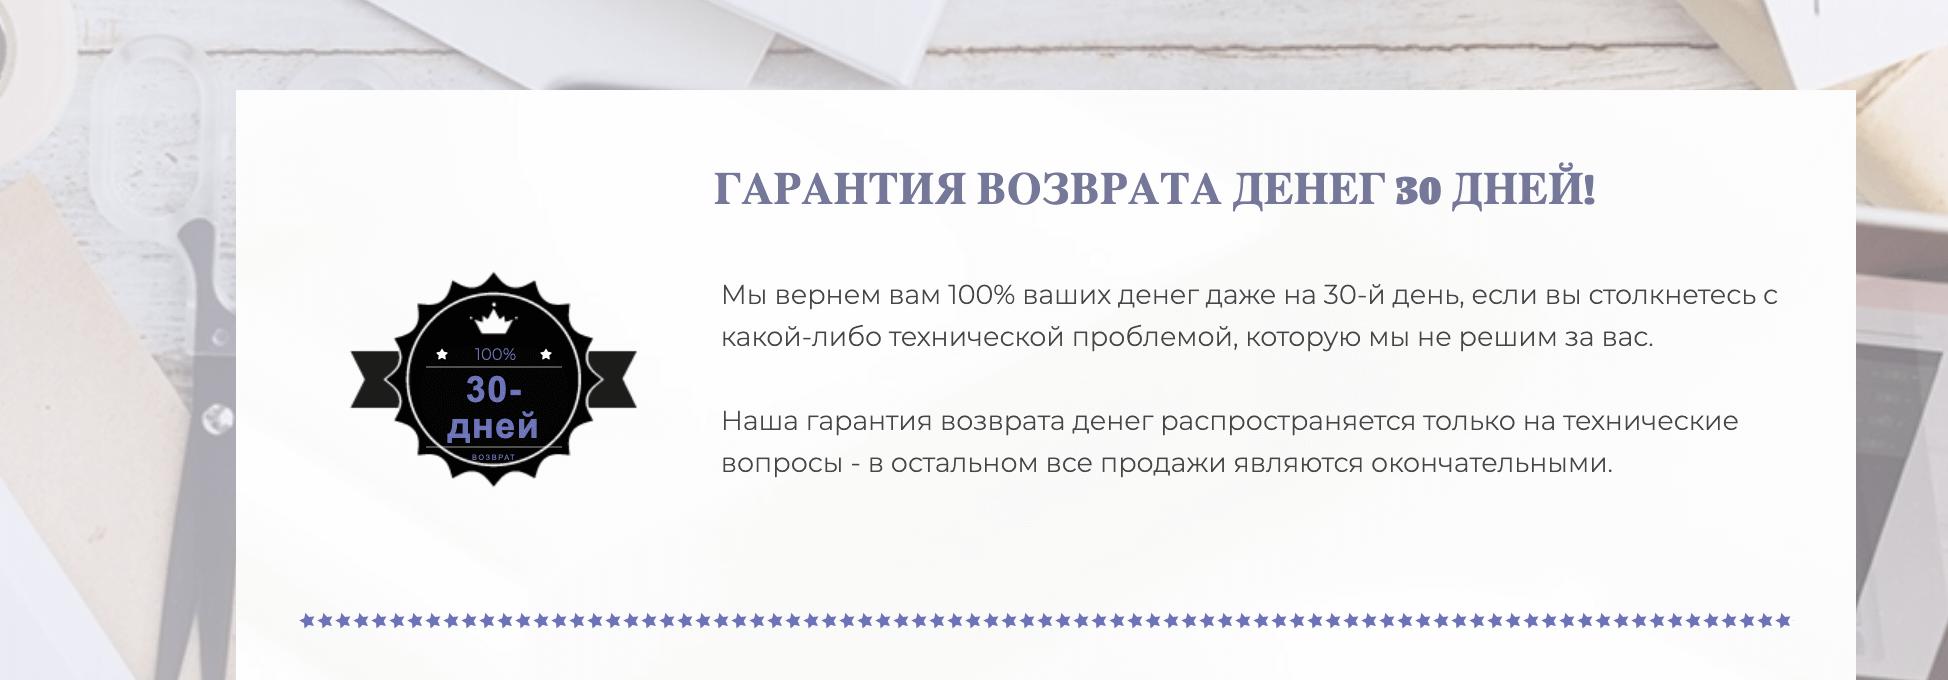 Курс Михаила Иванова